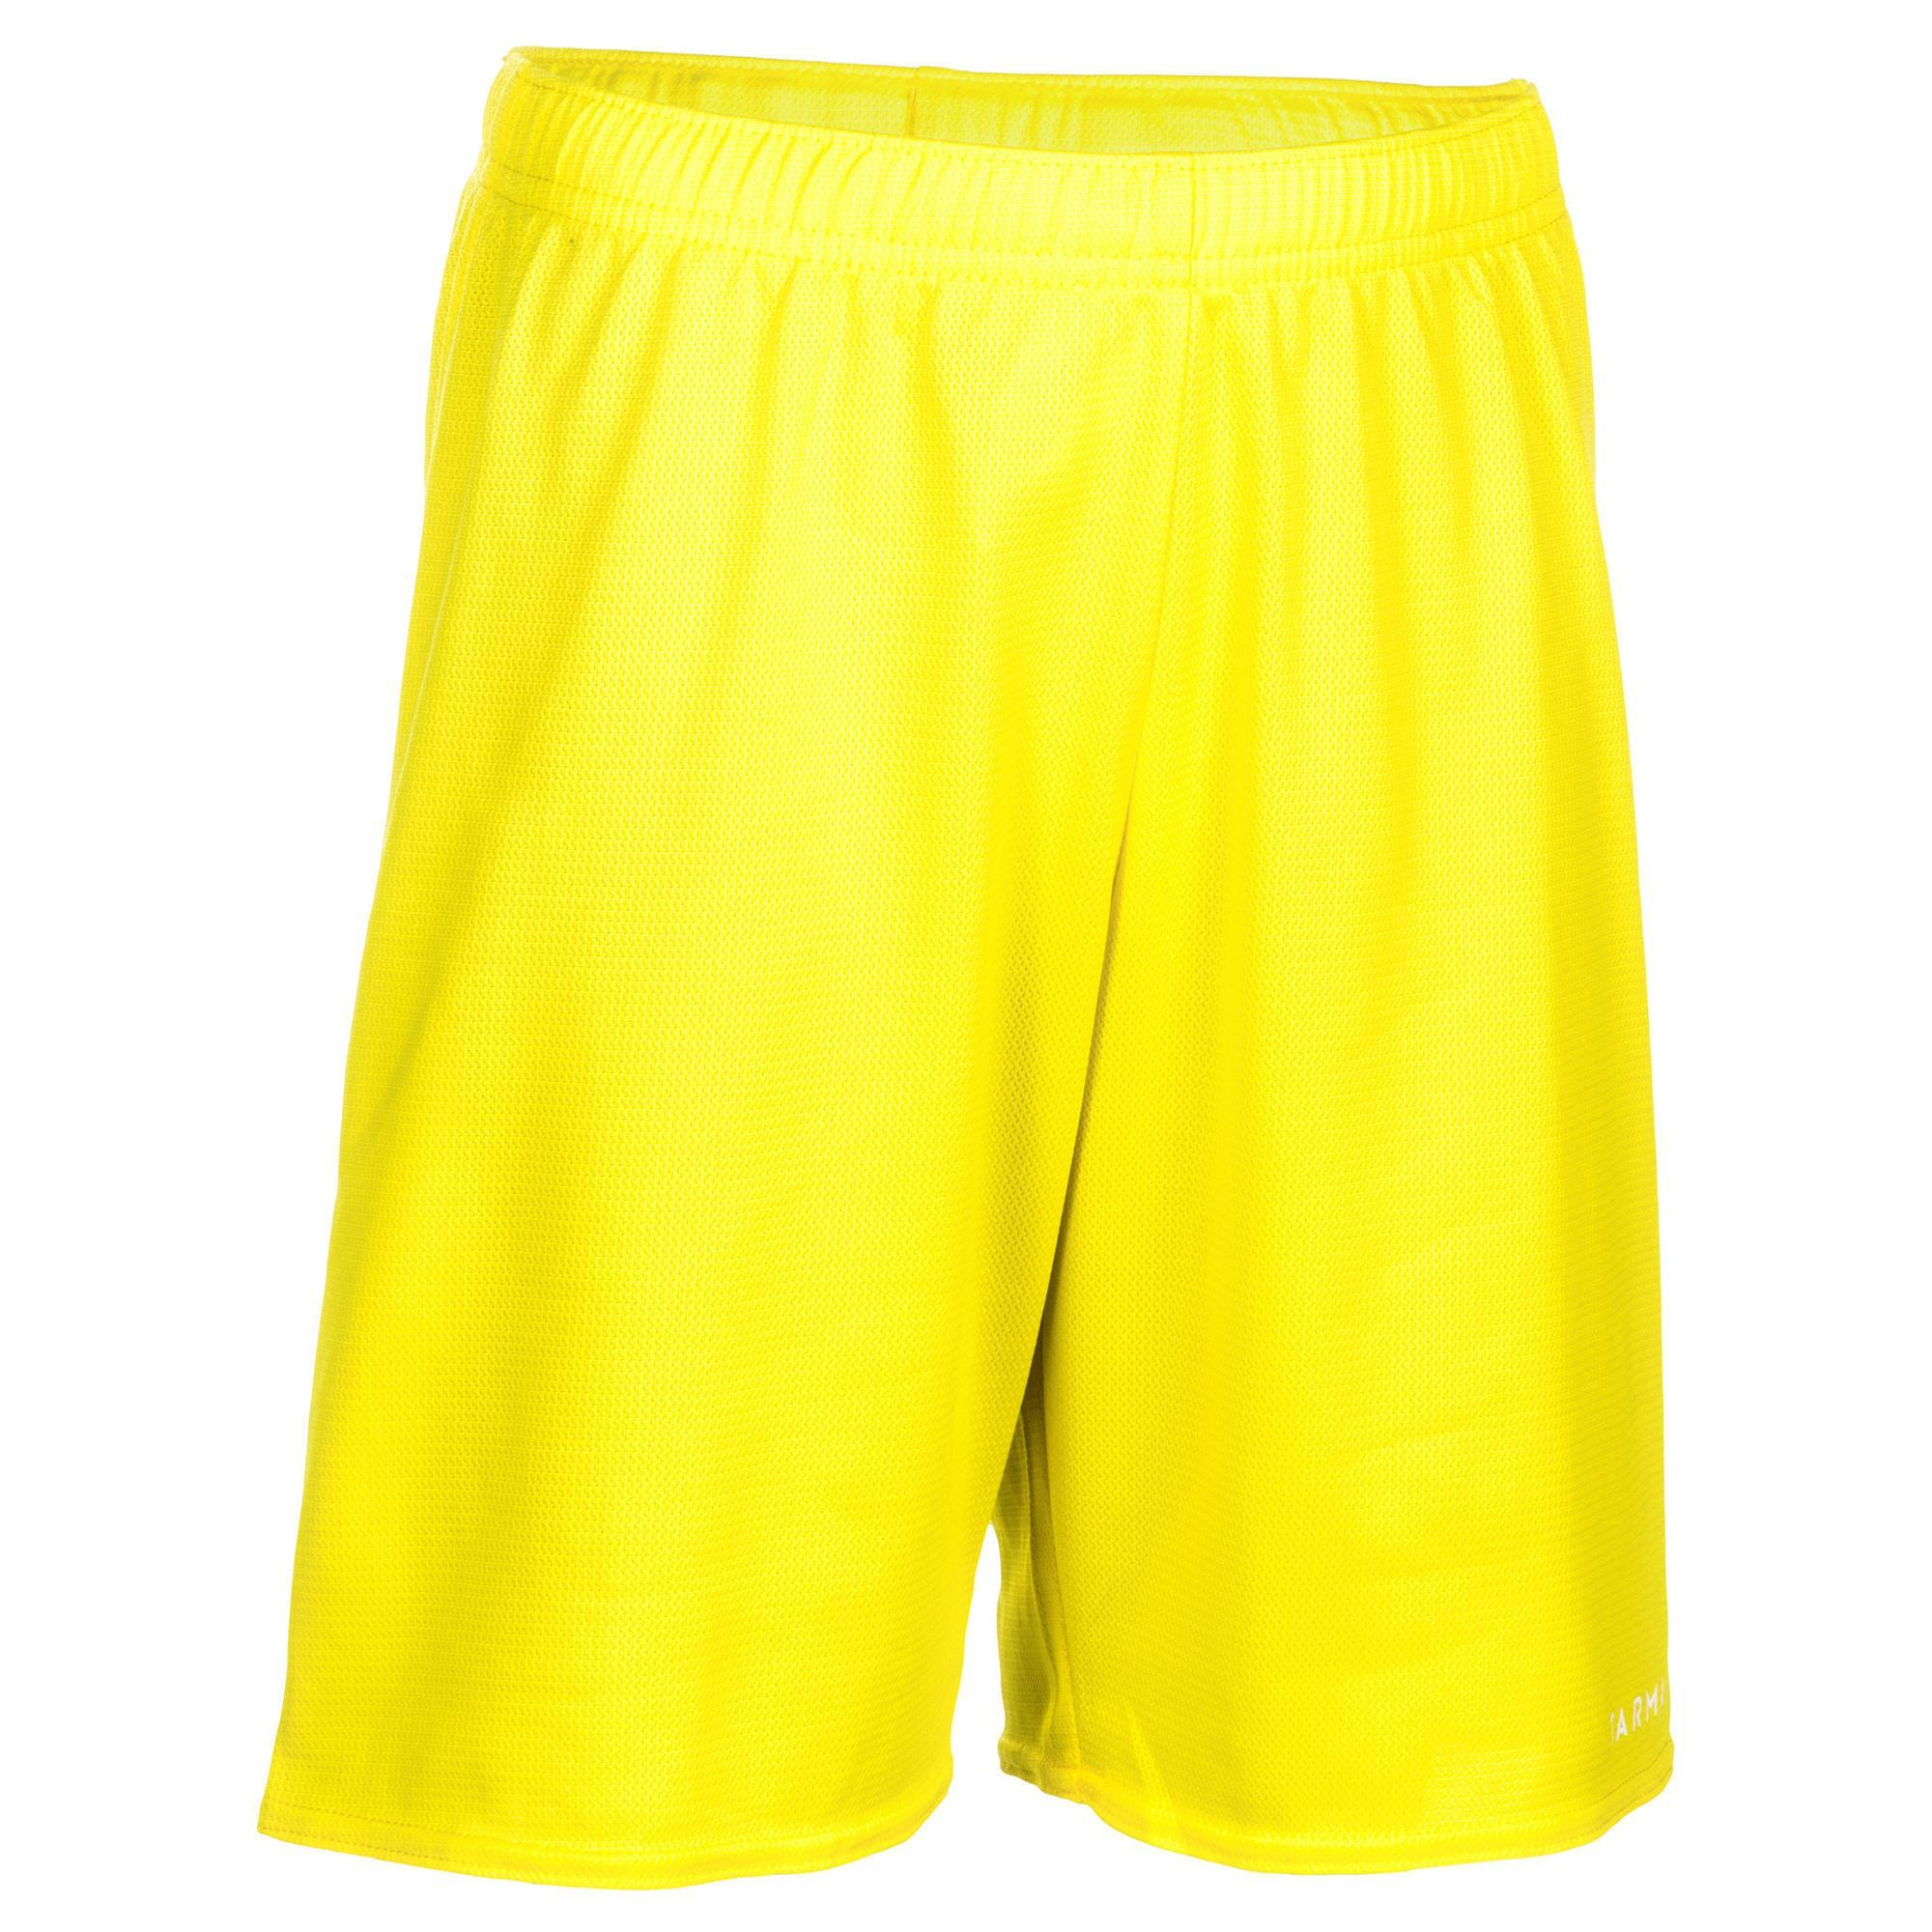 Basketballshorts SH100 Kinder Einsteiger gelb   Sportbekleidung > Sporthosen > Basketballshorts   Tarmak